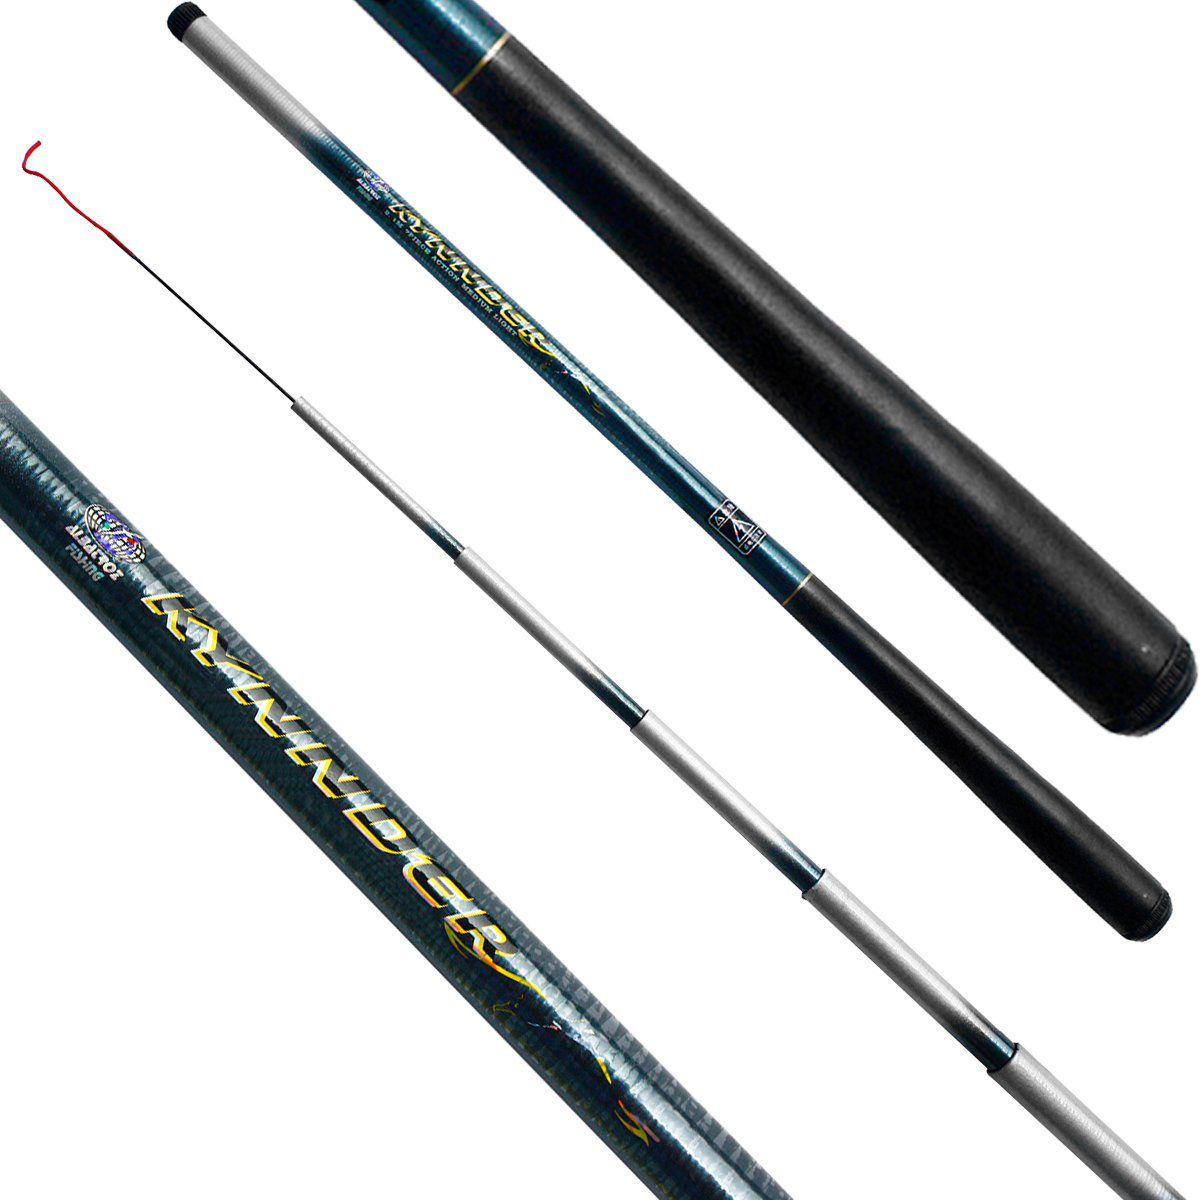 Vara Telescópica Albatroz Fishing Kynnder 2107 2,10m 7s